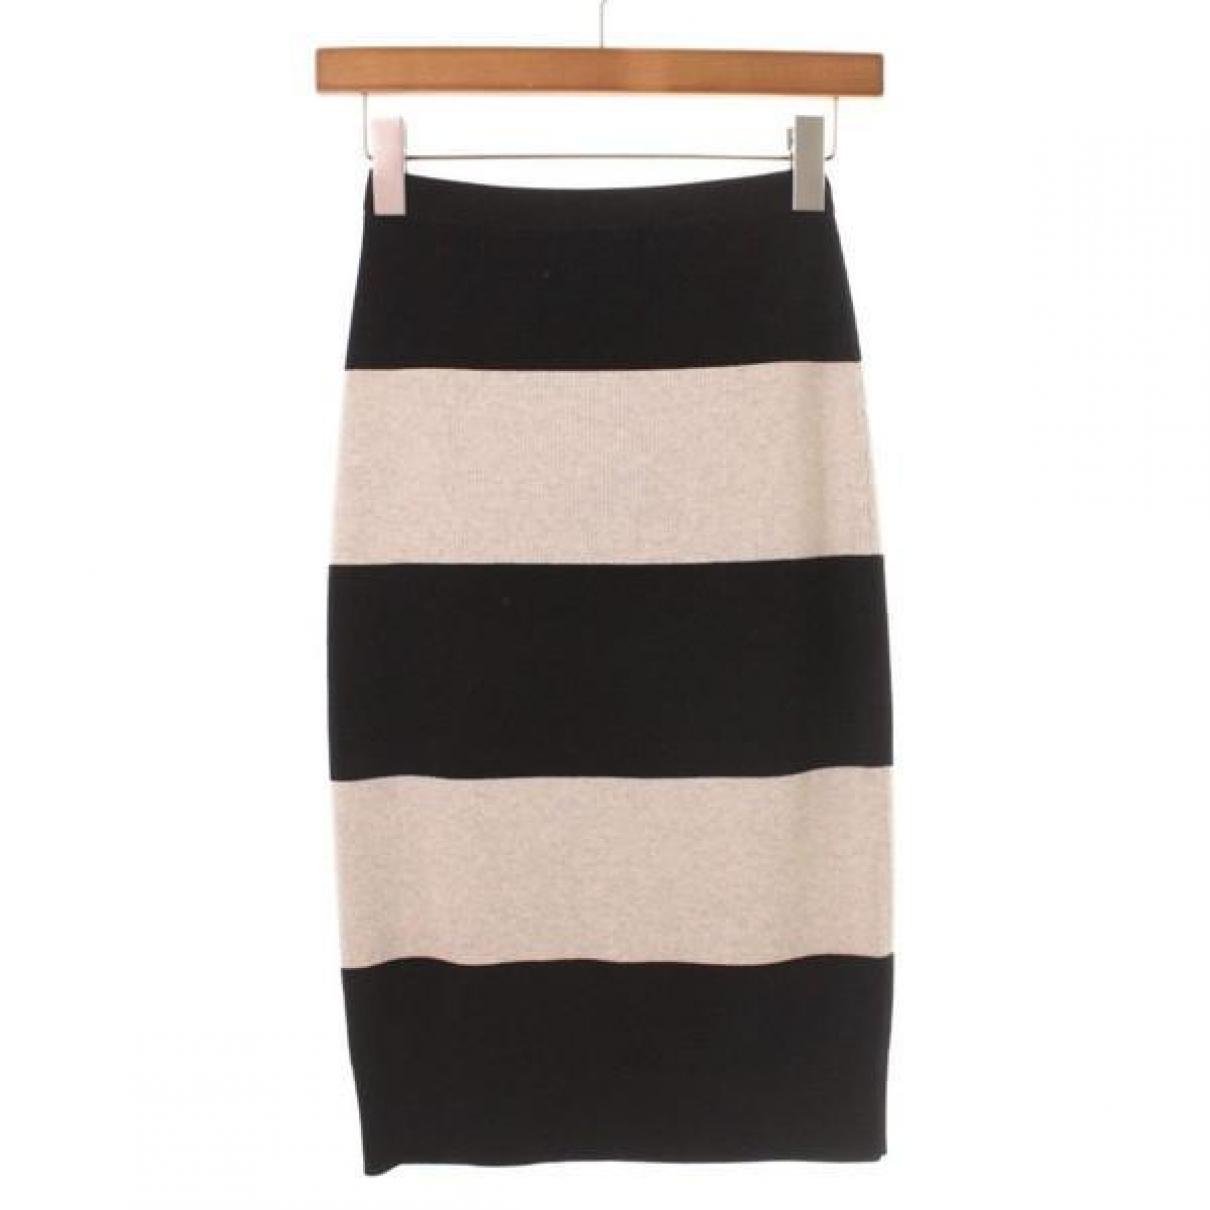 Dries Van Noten \N Black skirt for Women XS International